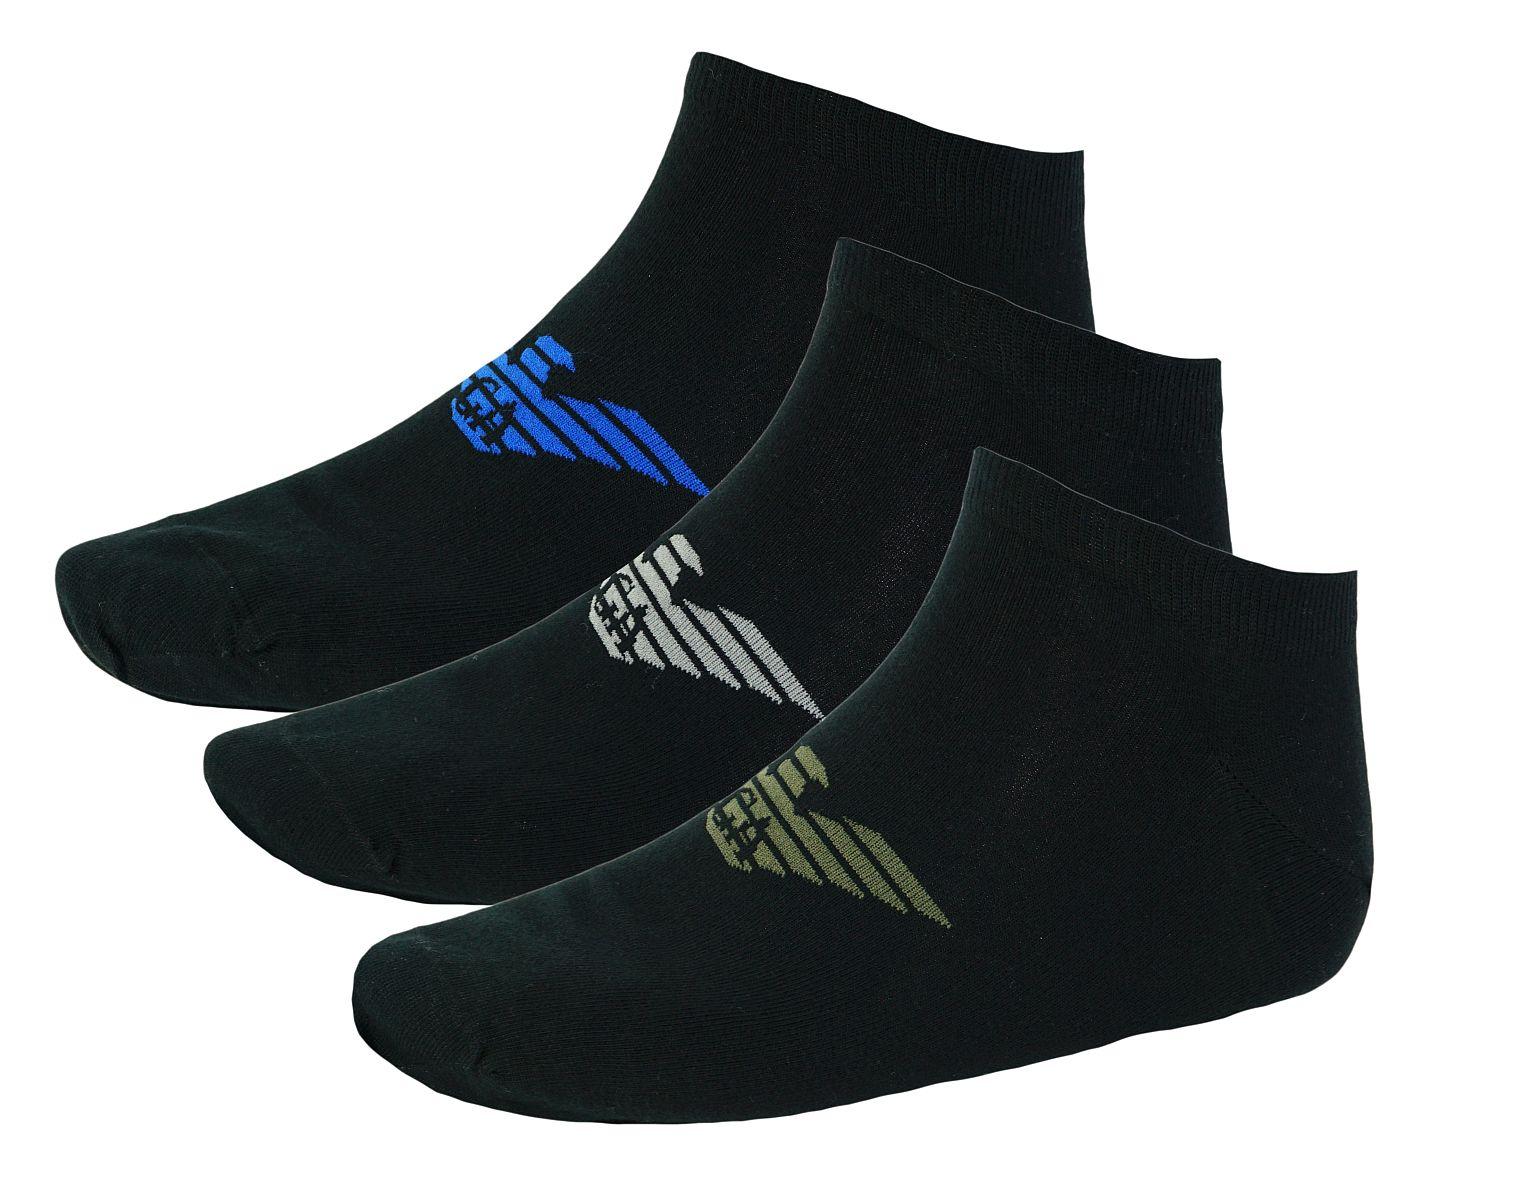 Emporio Armani 3er Pack Strümpfe Socken 8929BX Calza Inside 300008 7A234 NERO HW17-EAX1